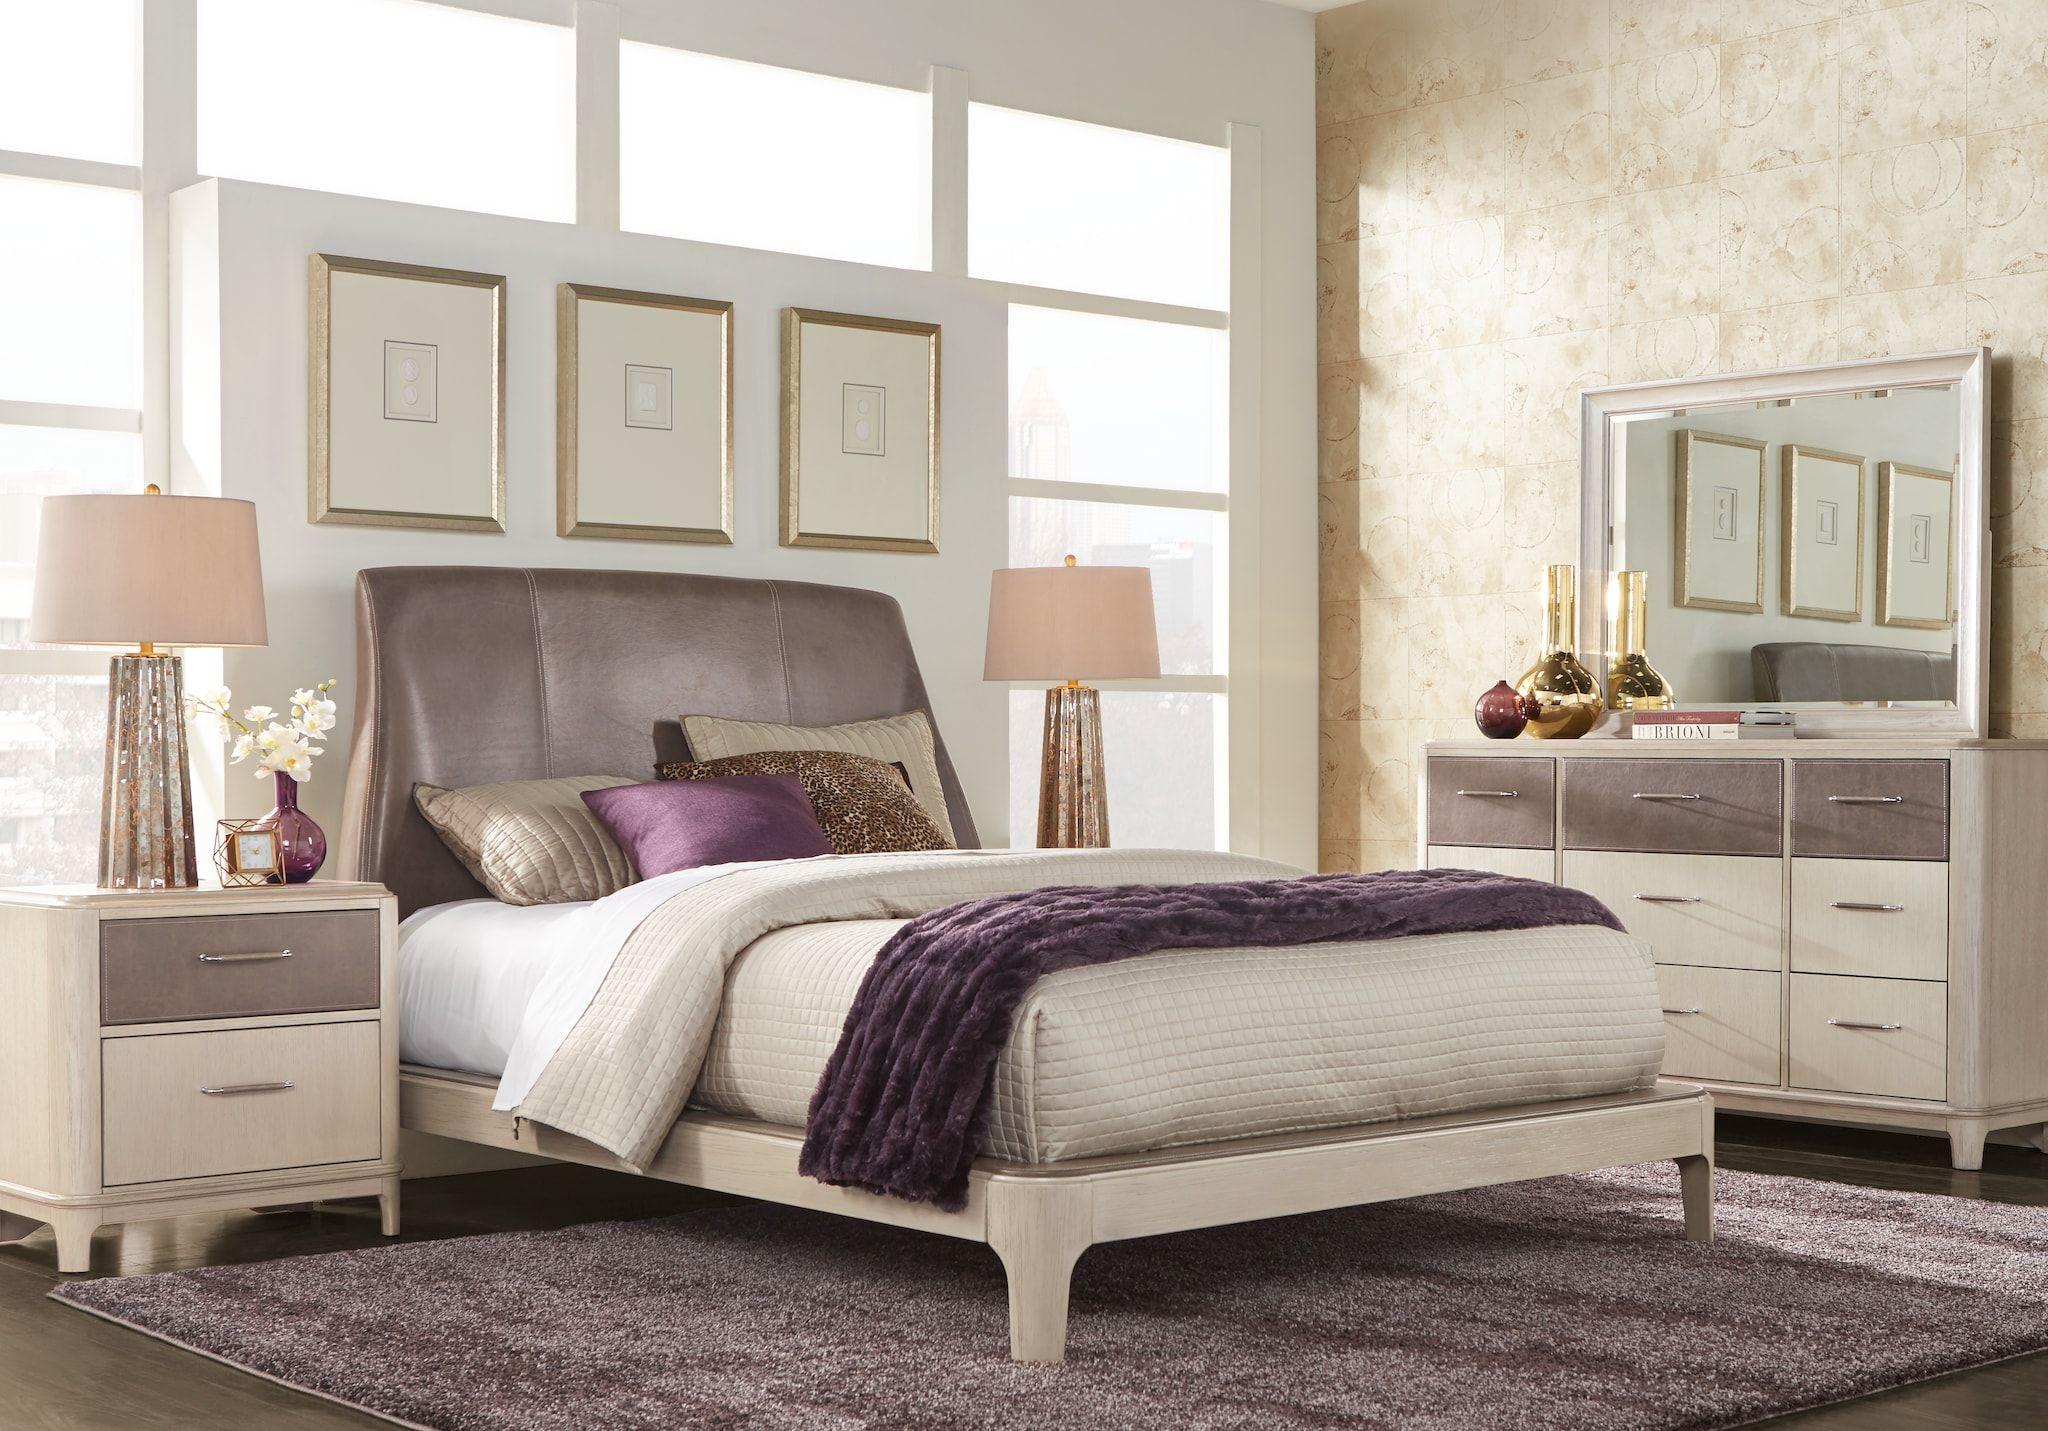 queen upholstered bedroom sets for sale: 5 & 6-piece